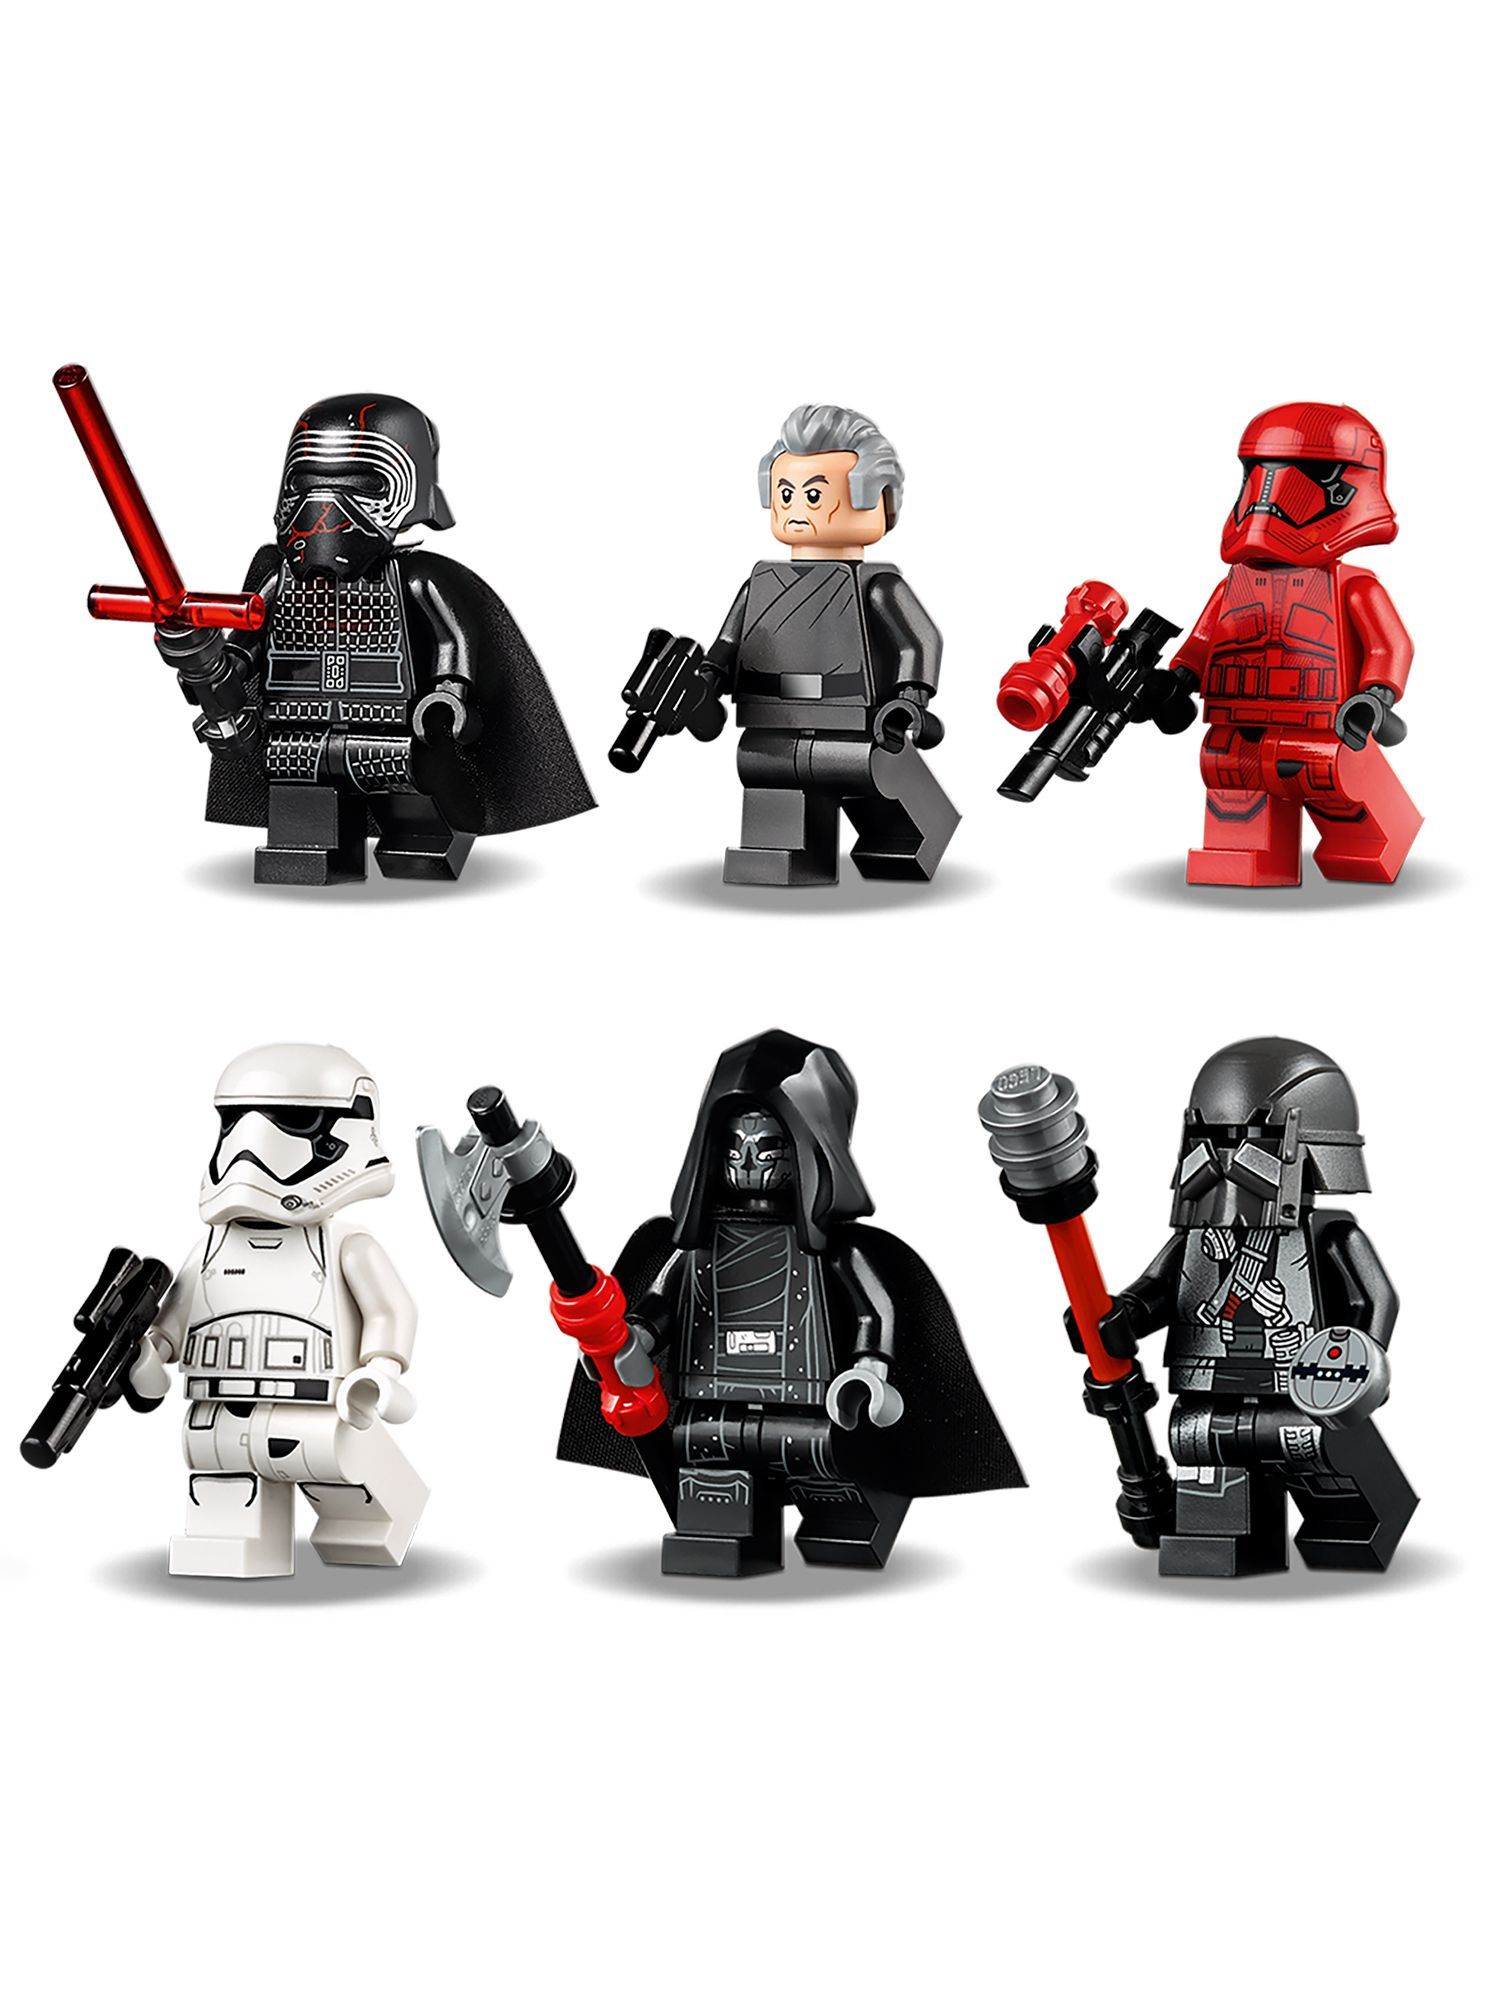 Lego Star Wars 75256 Kylo Ren S Shuttle In 2020 Lego Star Wars Lego Star Star Wars Minifigures